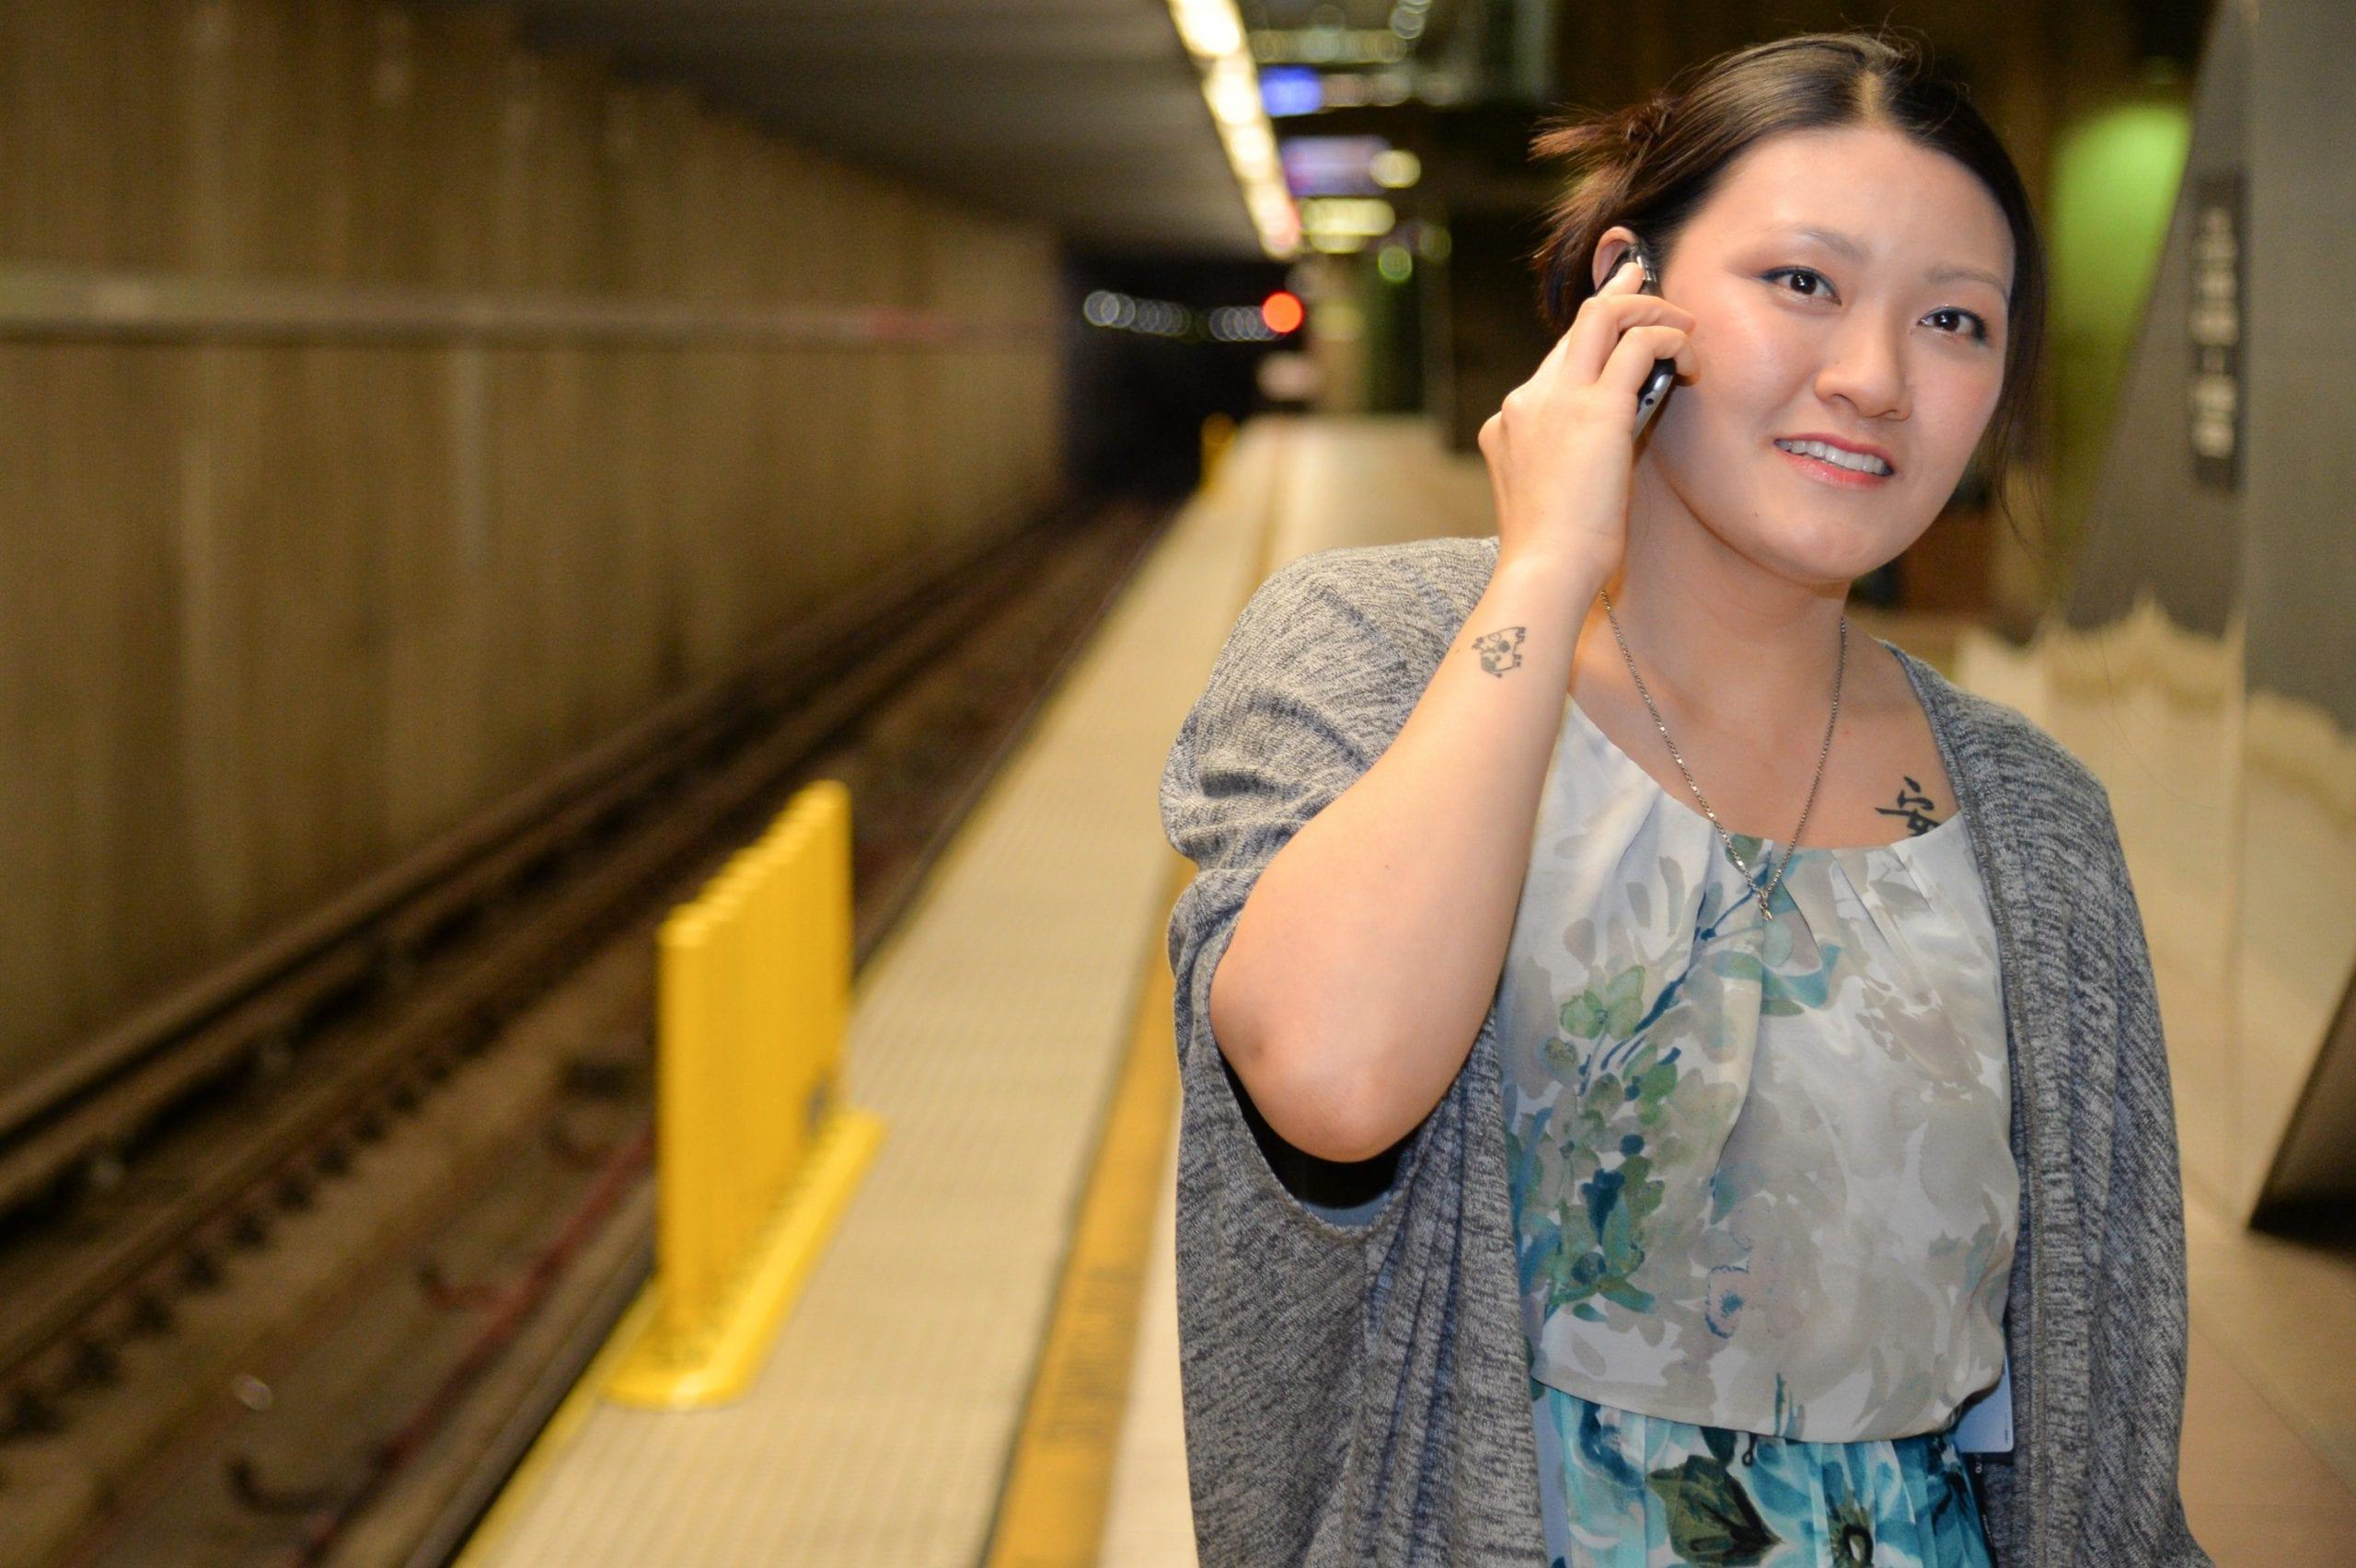 My colleague Anna enjoys a nonsensical cell phone conversation deep beneath Union Station. Photo: Steve Hymon/Metro.